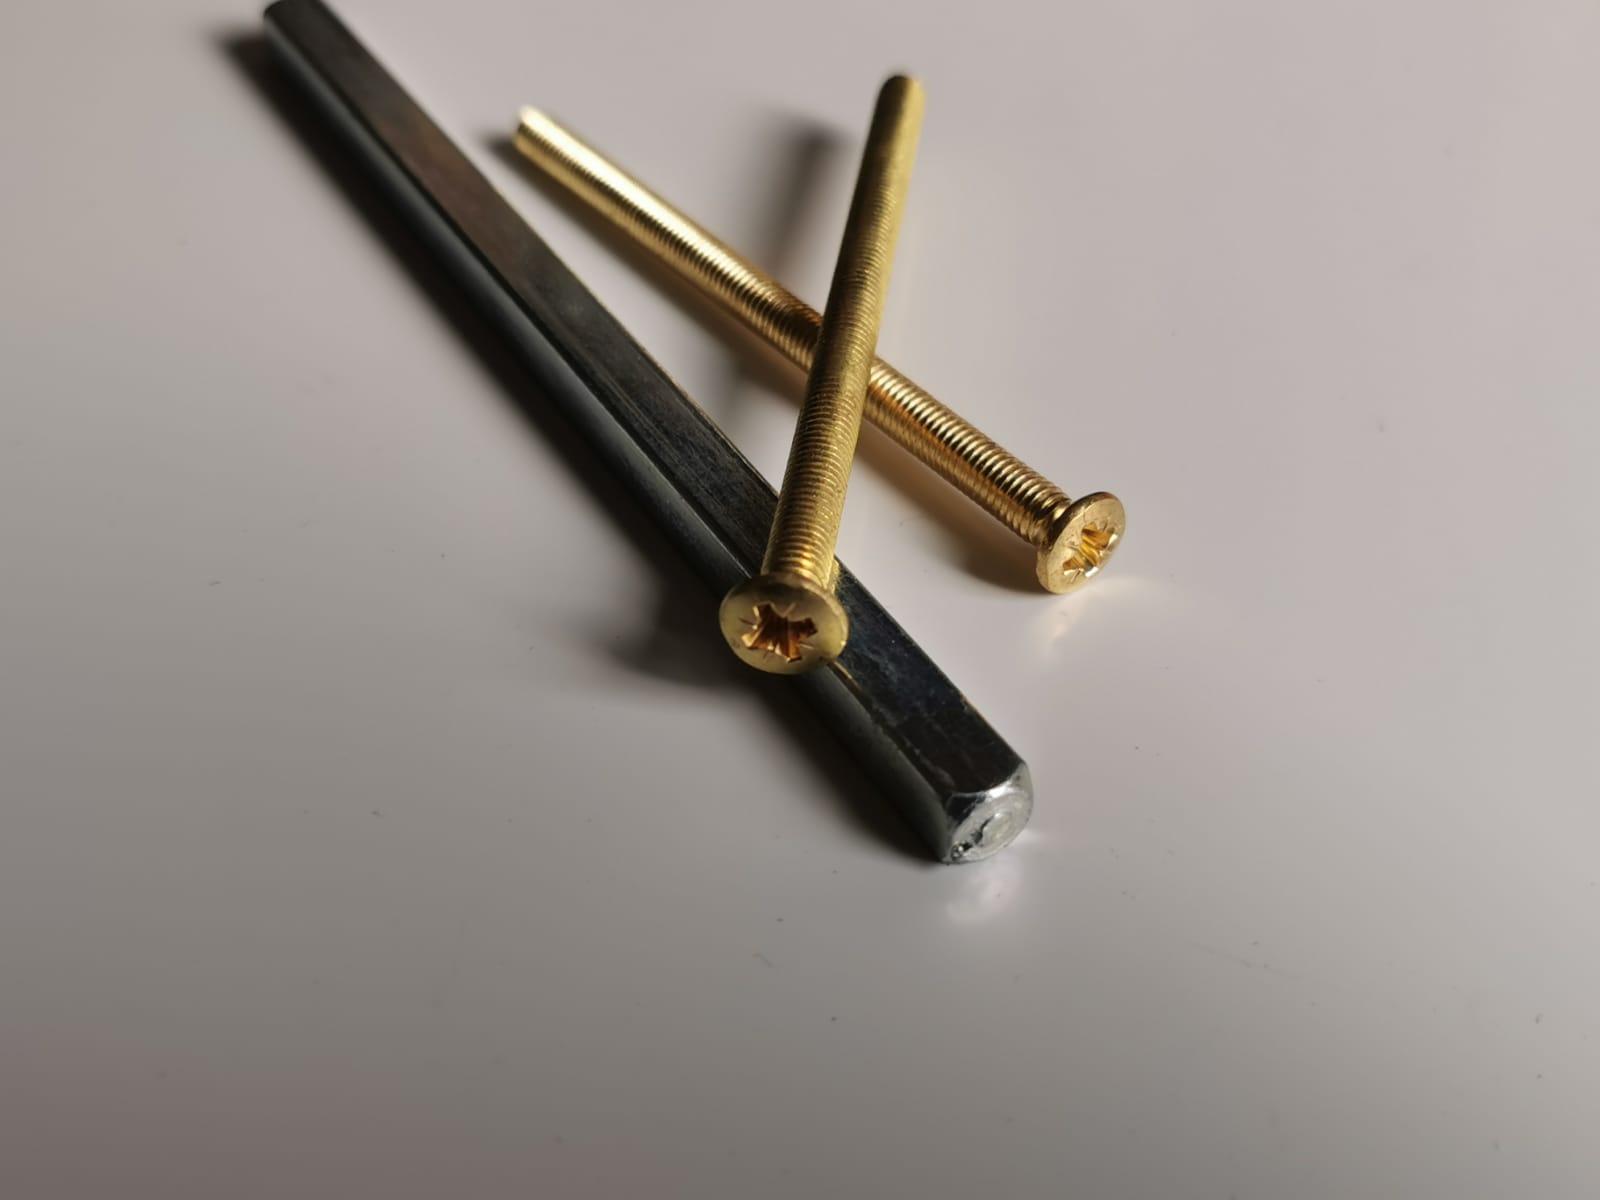 buy Door Handle Bolt Screws in gold, 5mm x 80mm / M5 Long Dome Head + 7mm Handle Lever Spindle 130mm Long online